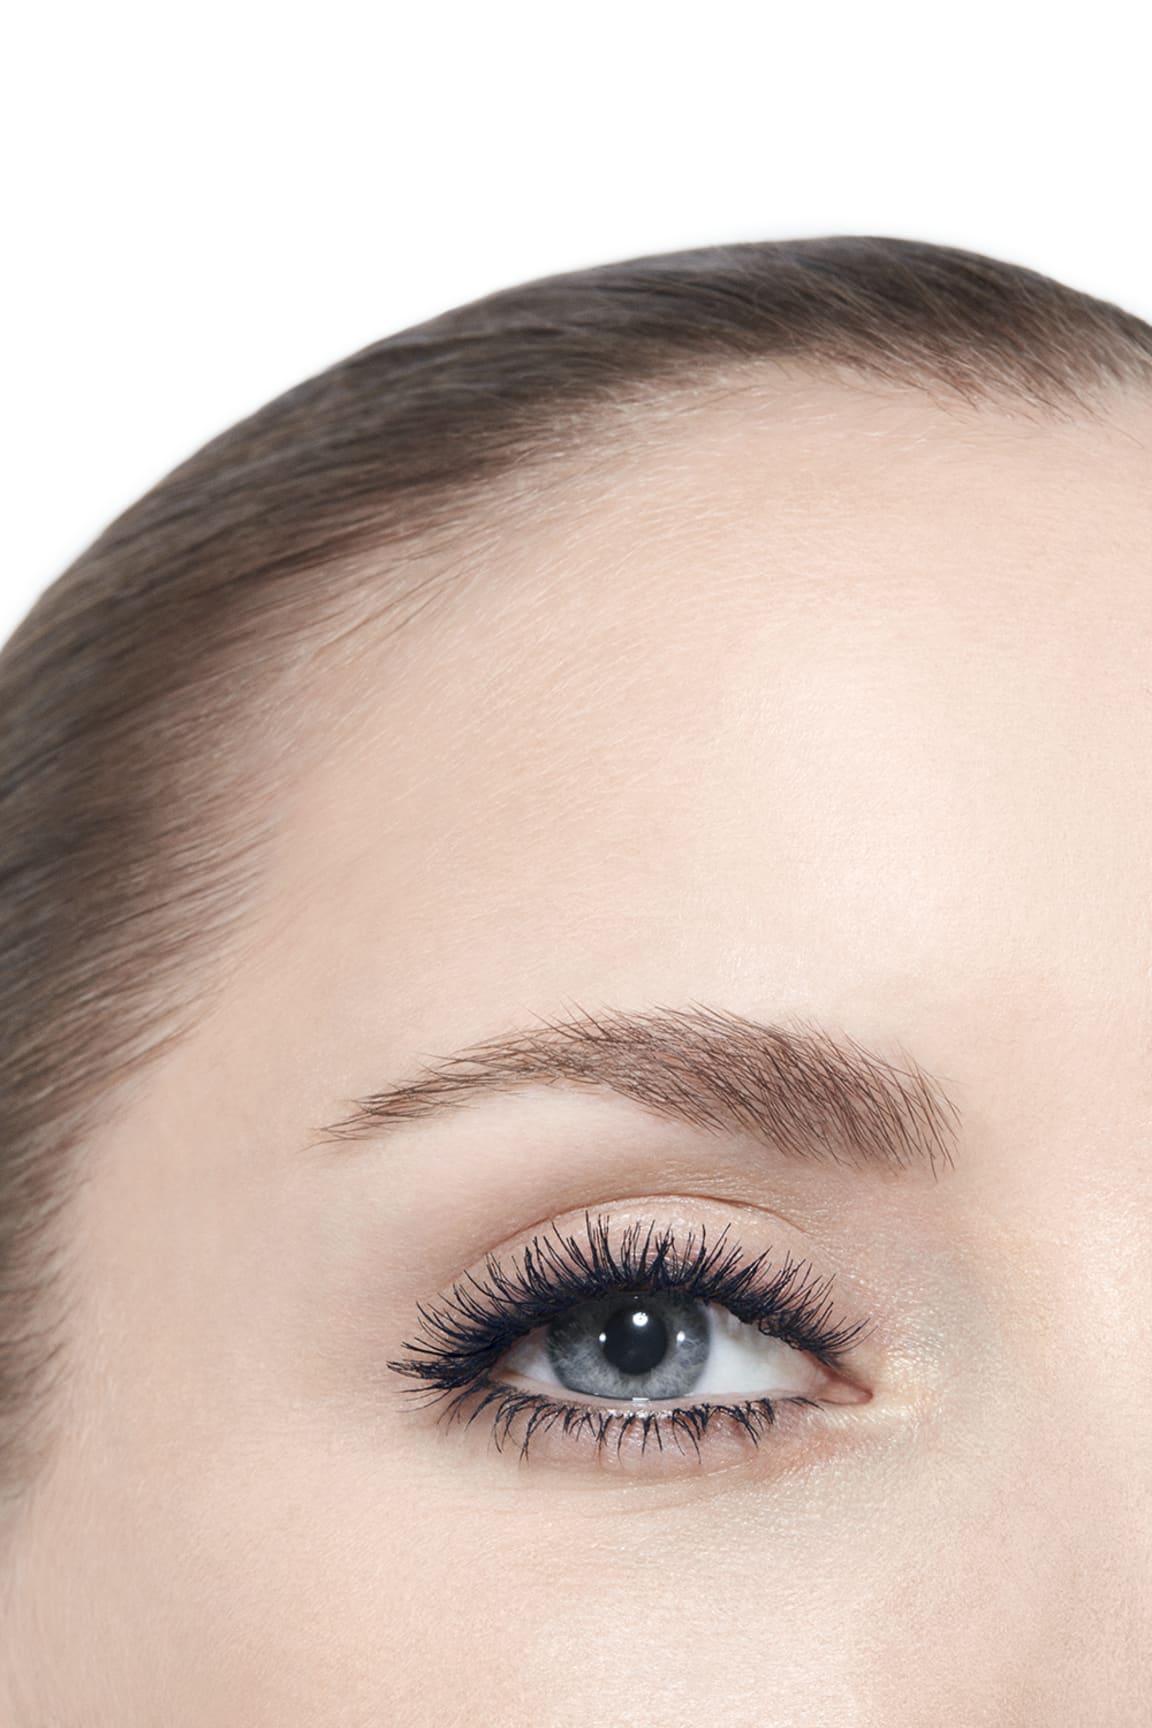 Application makeup visual 3 - LE VOLUME DE CHANEL 70 - BLUE NIGHT